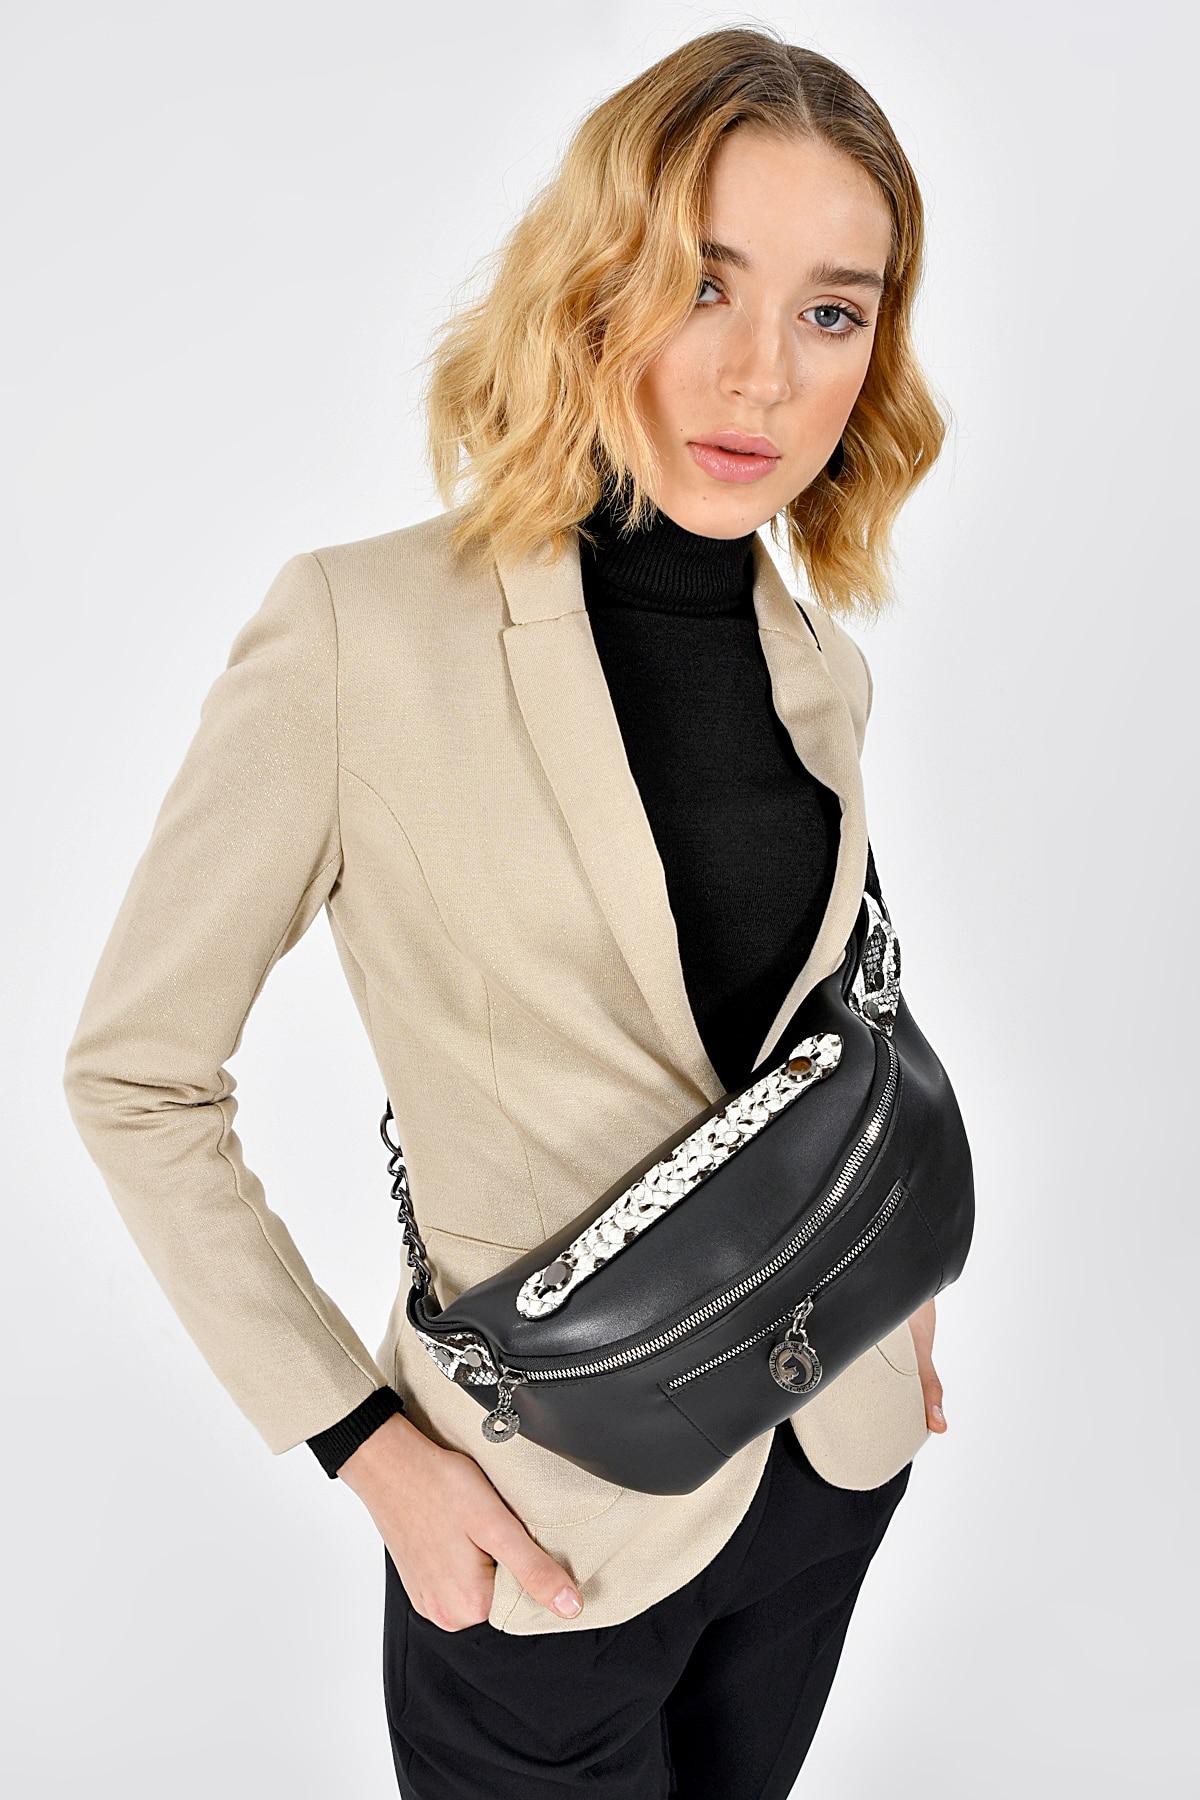 Aqua Di Polo APCR2-A0230-KD131 Women Waist Bag Belt Bag Black Faux Leather Bag Message Bag Phone Key Pouch Waist Packs